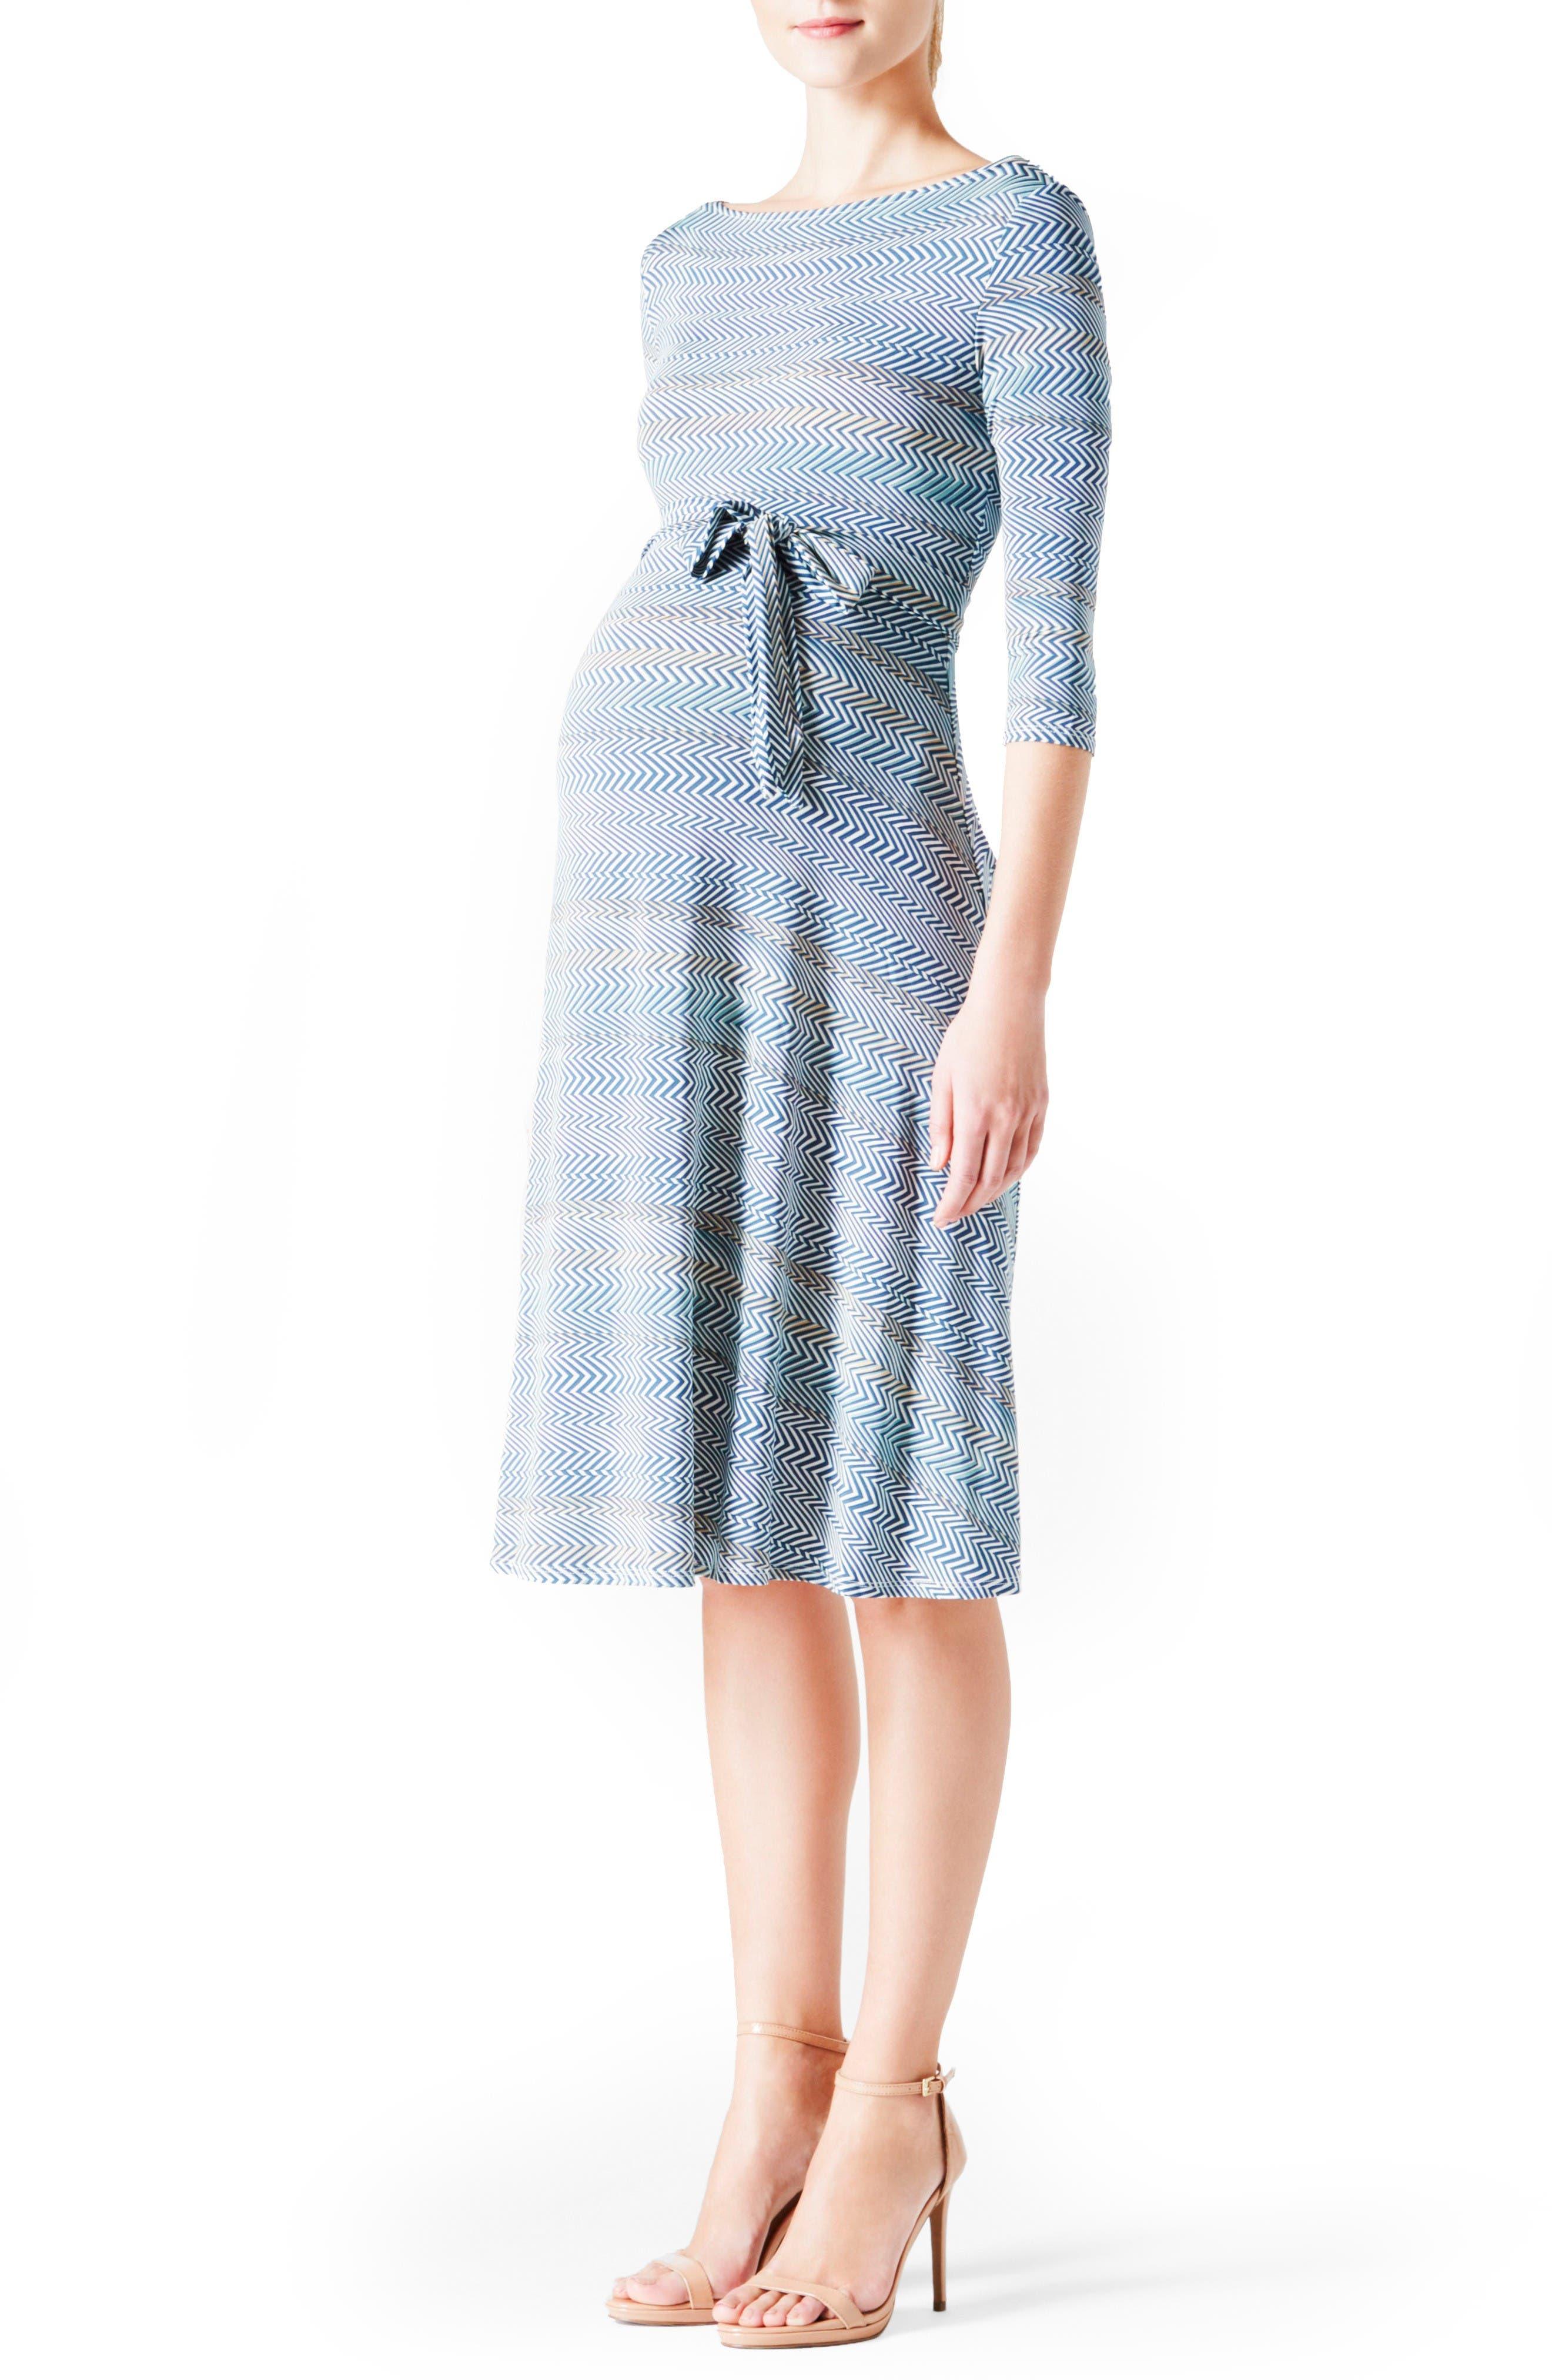 Leota 'Ilana' Belted Maternity Dress